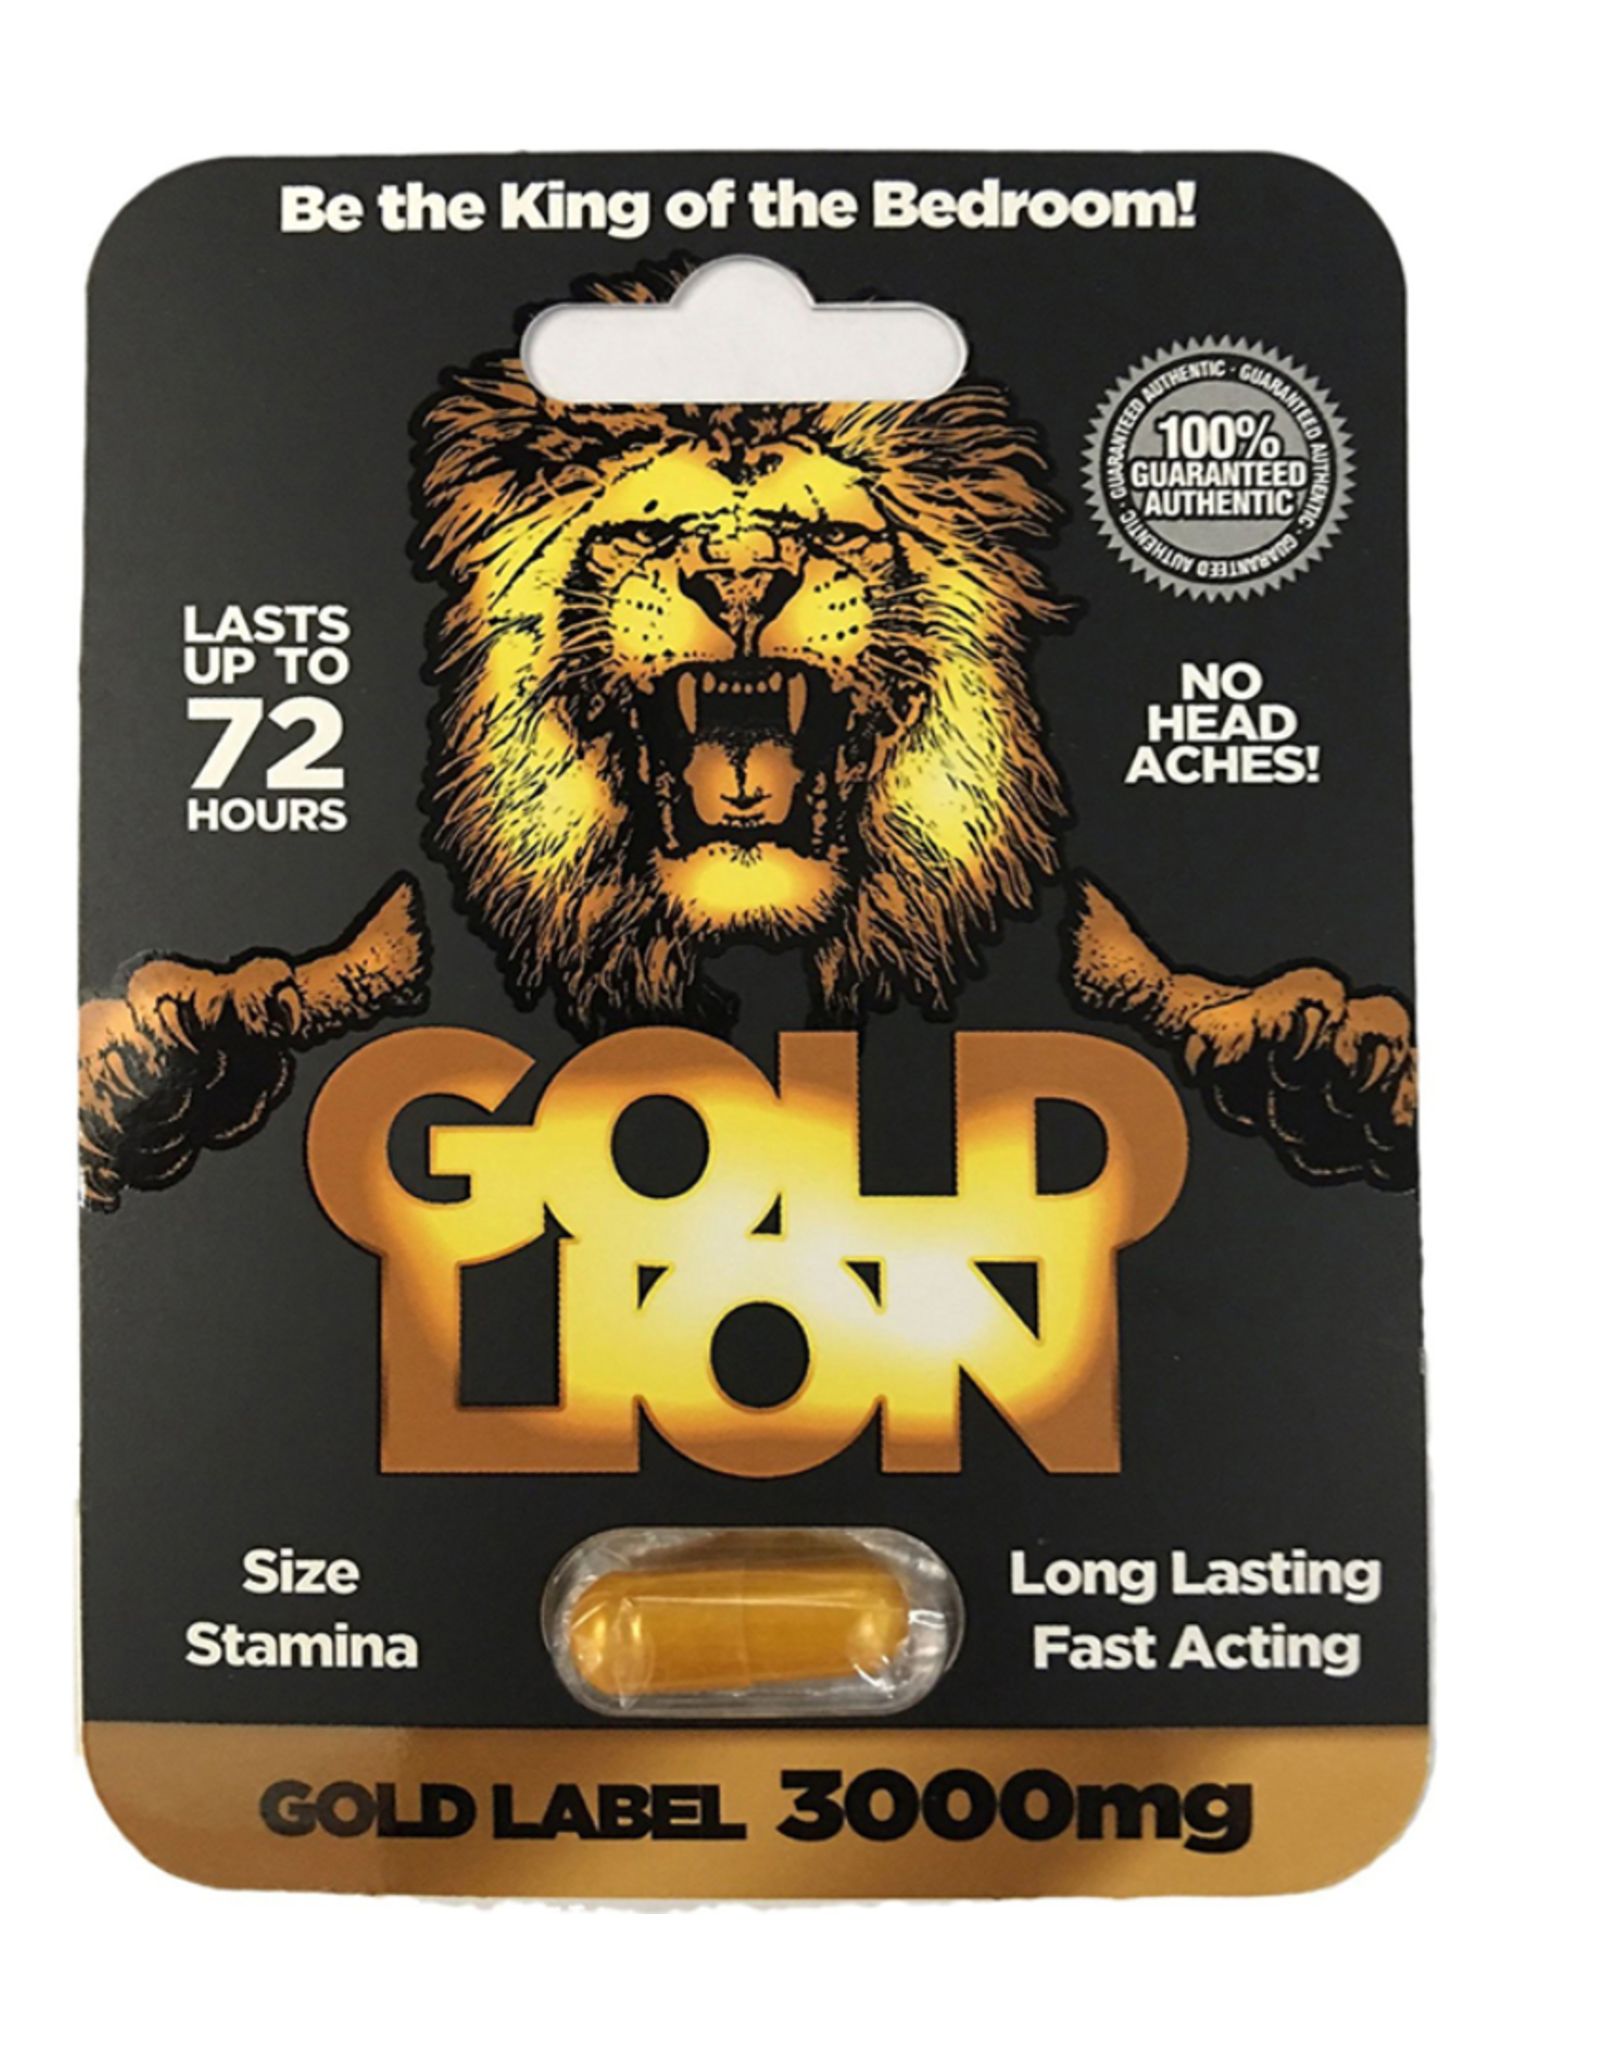 Gold Lion Male Enhancement Pill